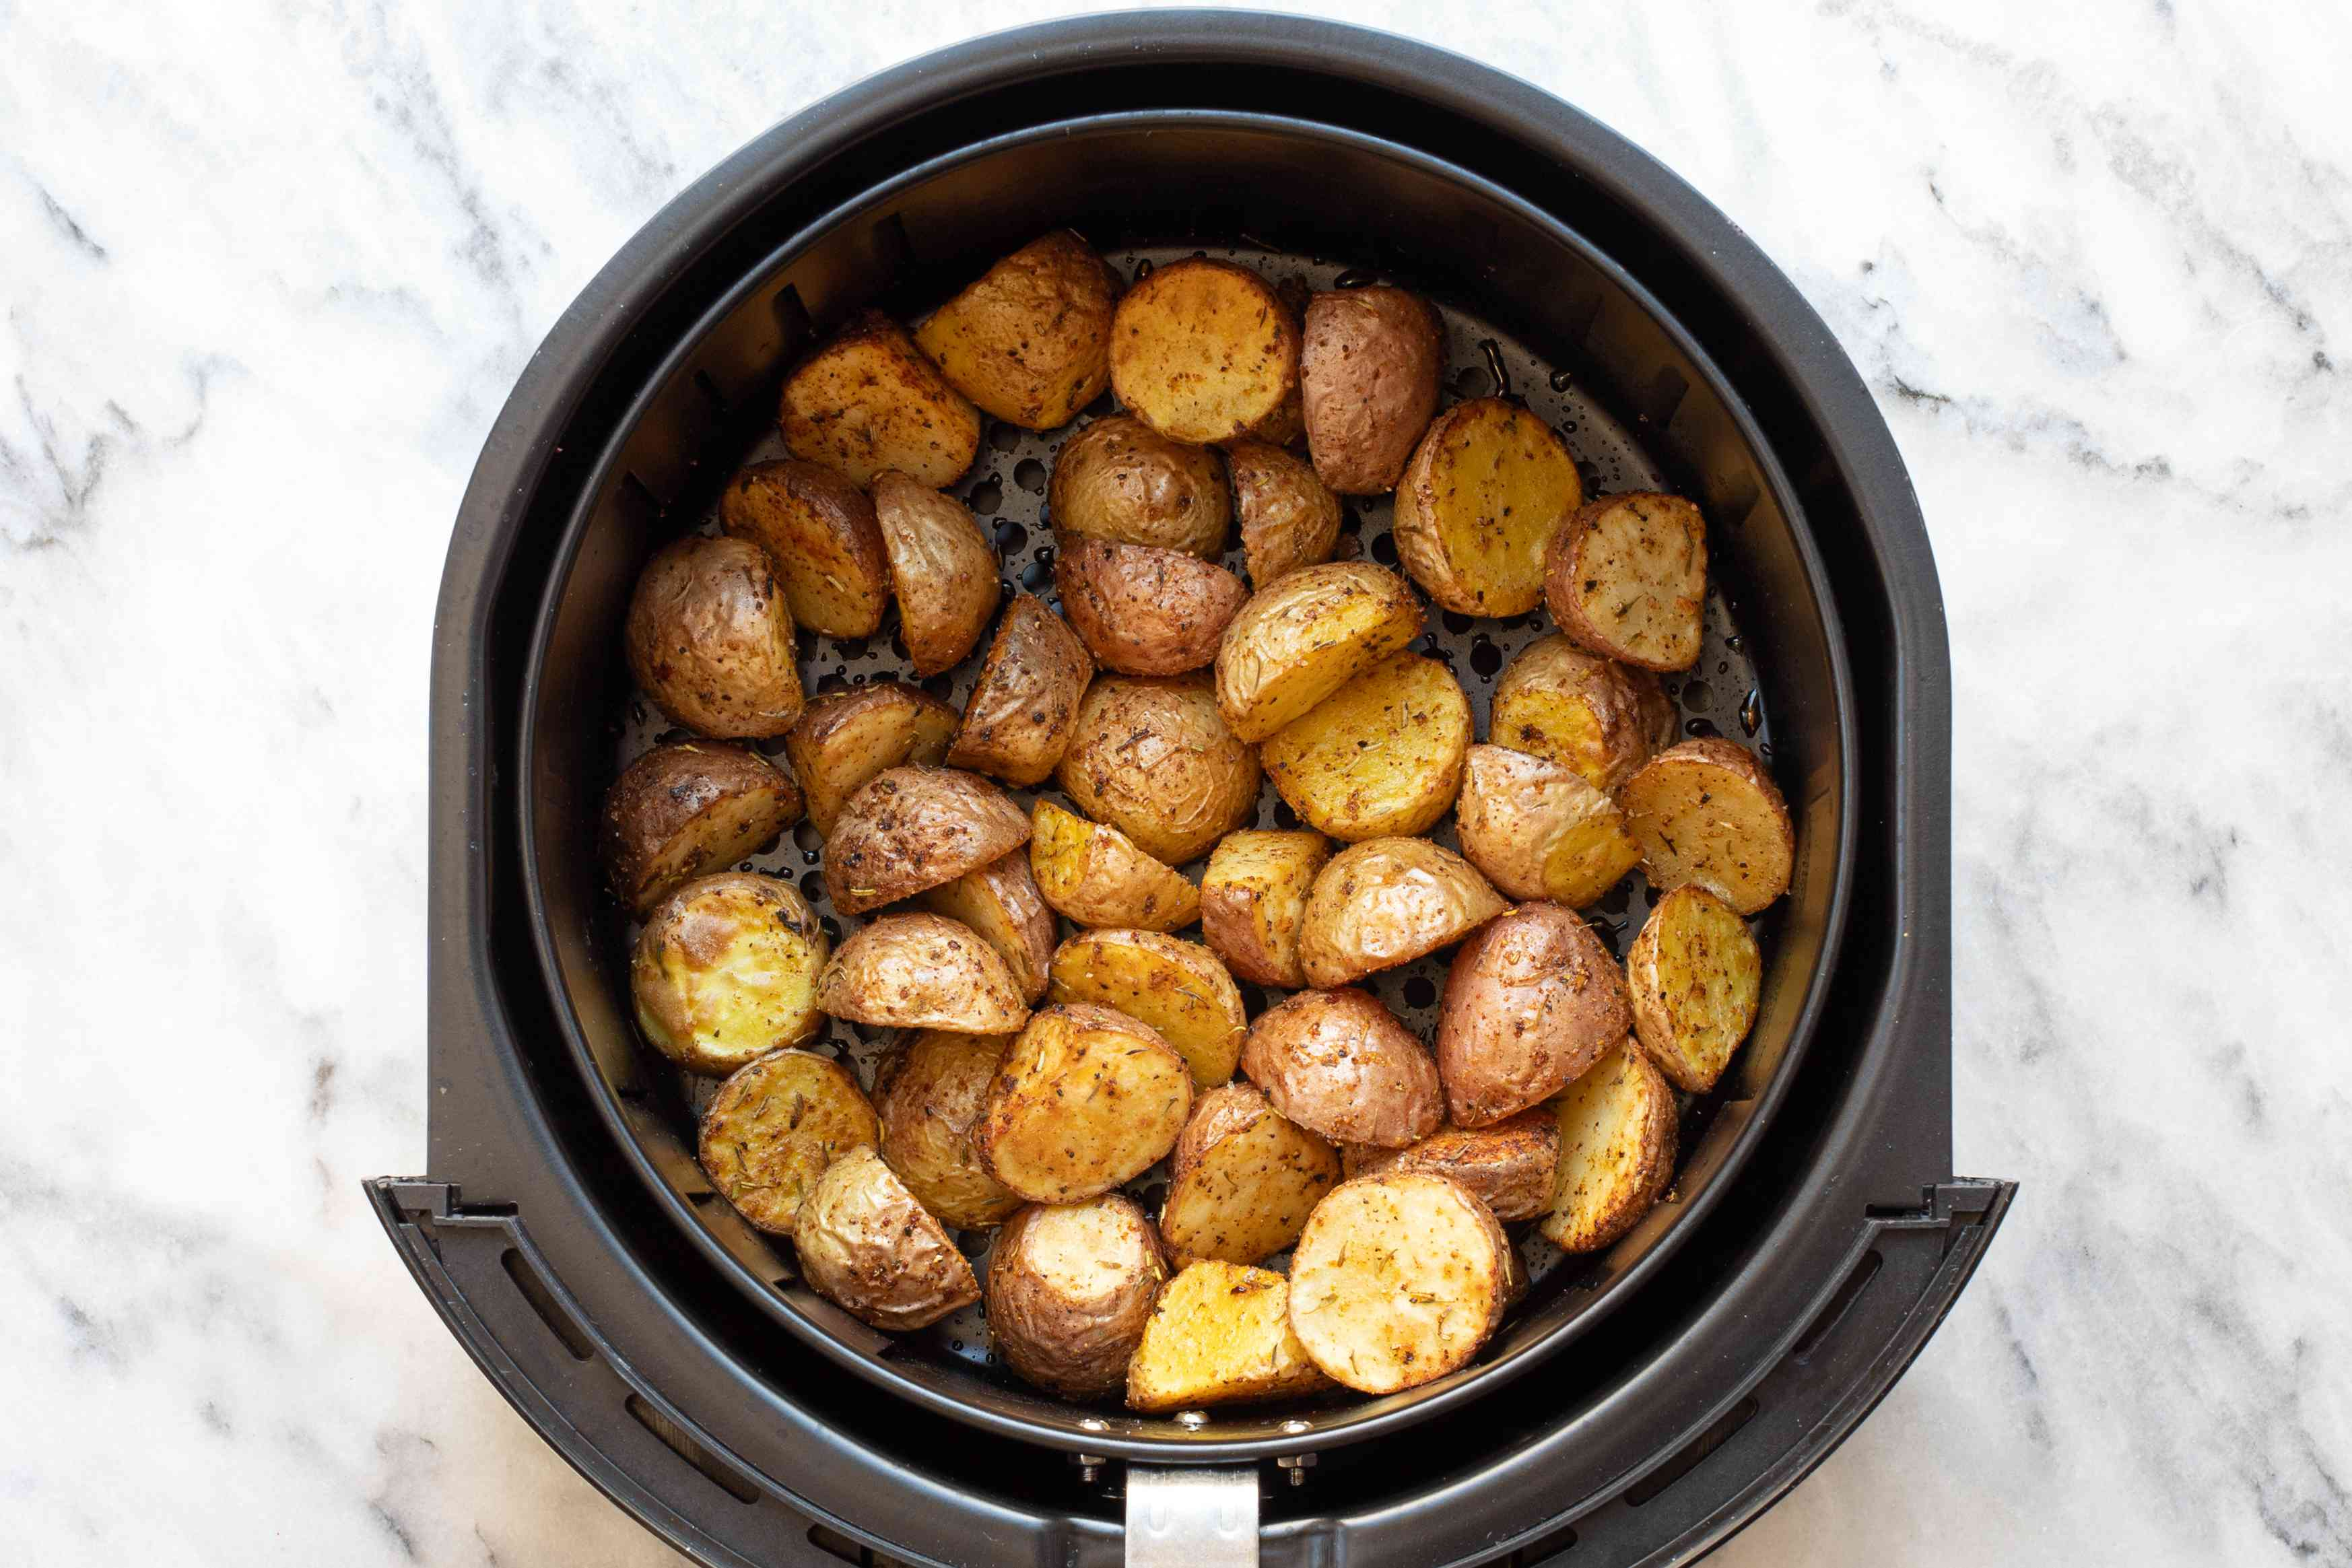 Air fryer potatoes halfway through cooking